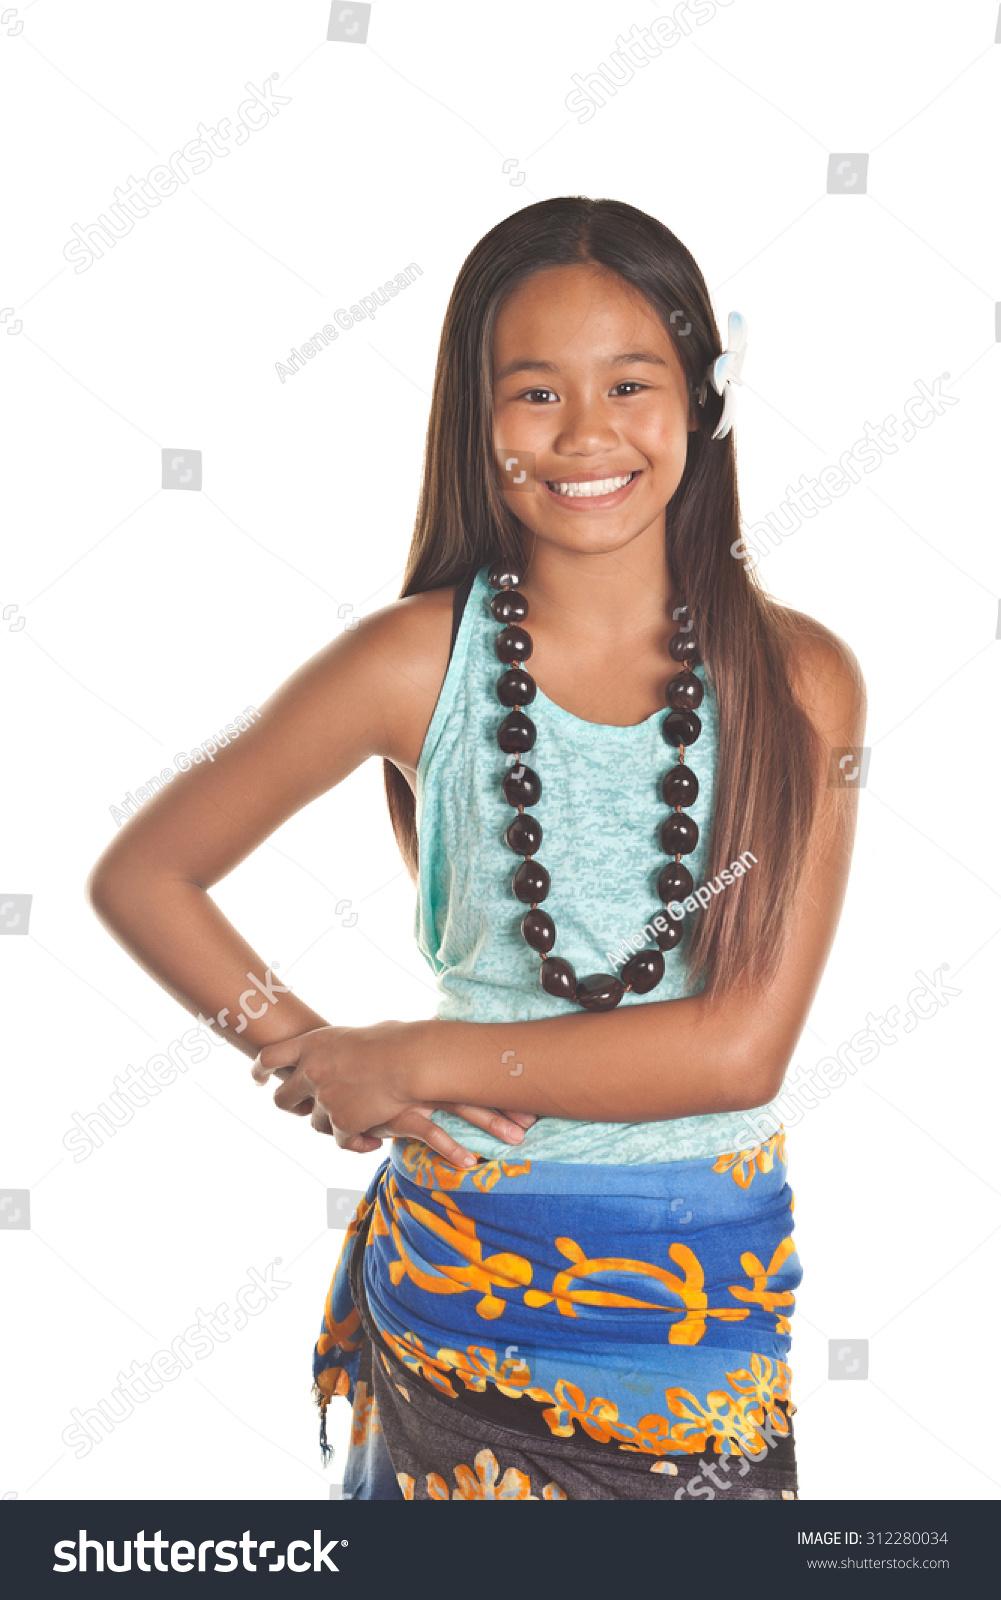 Tween Girl Wearing A Hula Dance Wrap And Kukui Royalty Free Stock Photo 312280034 Avopix Com